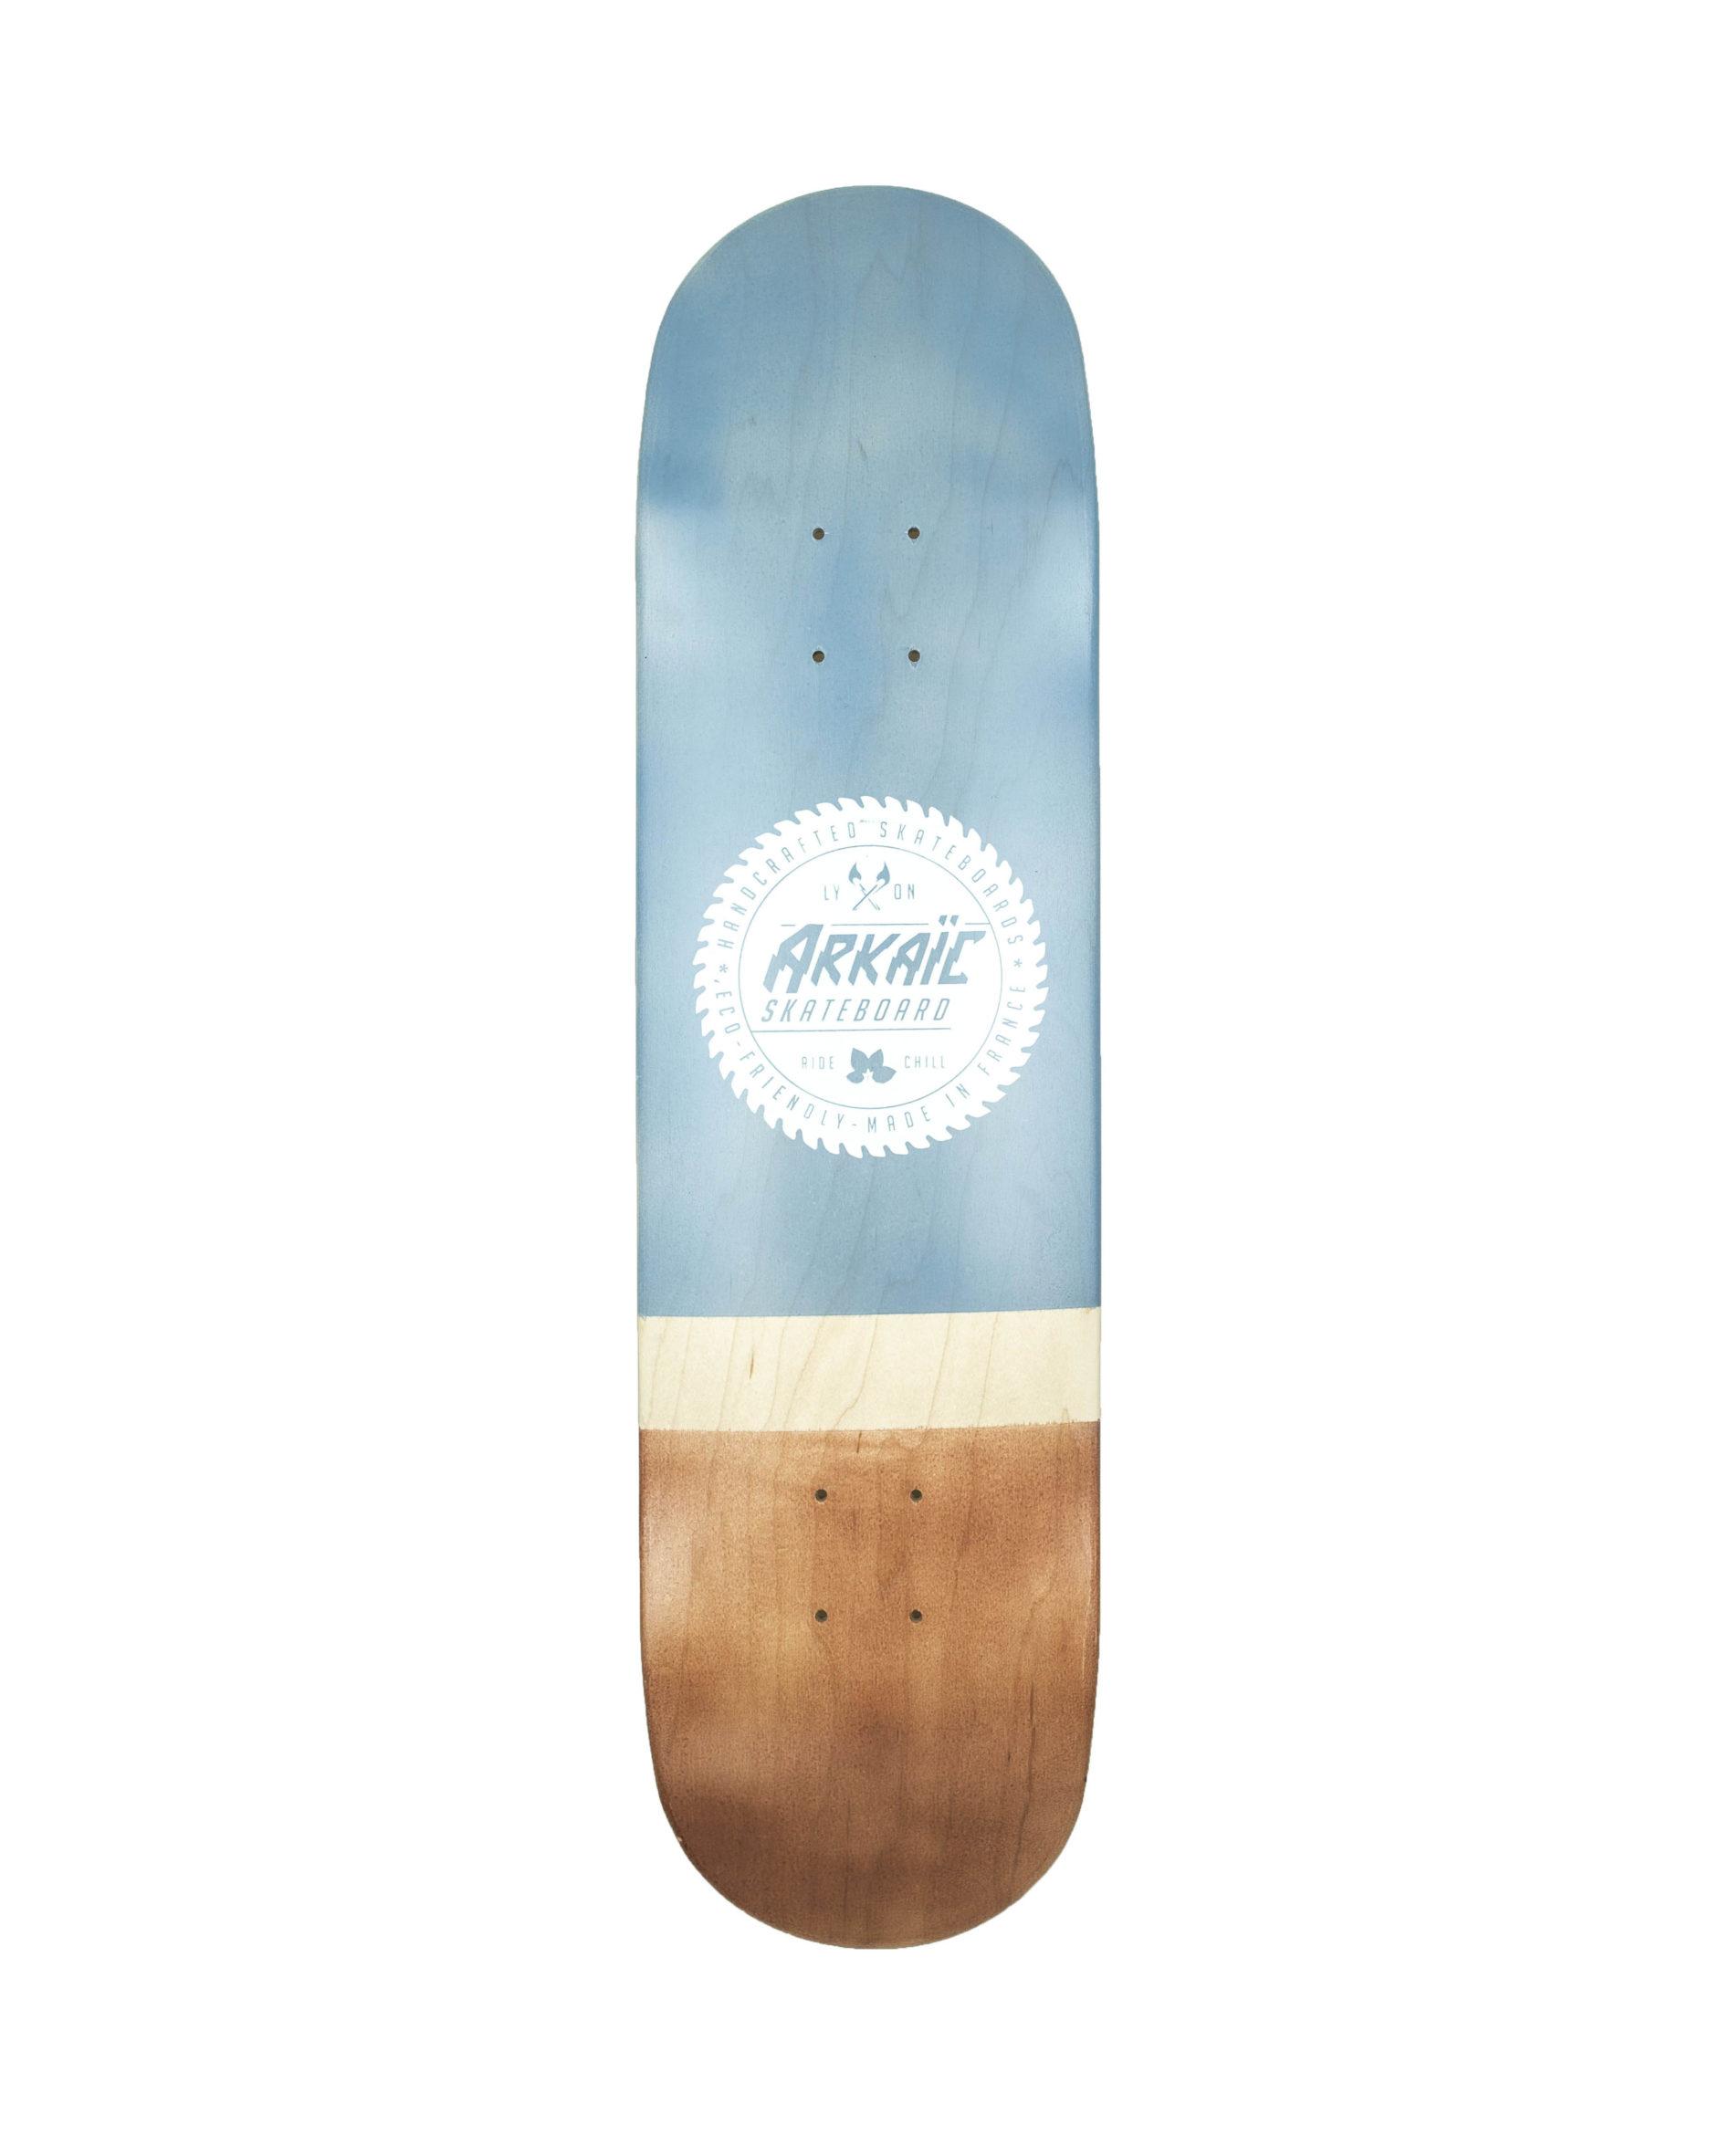 "Classical M 8"" SkateShop Lyon Street Arkaic Skateboard"